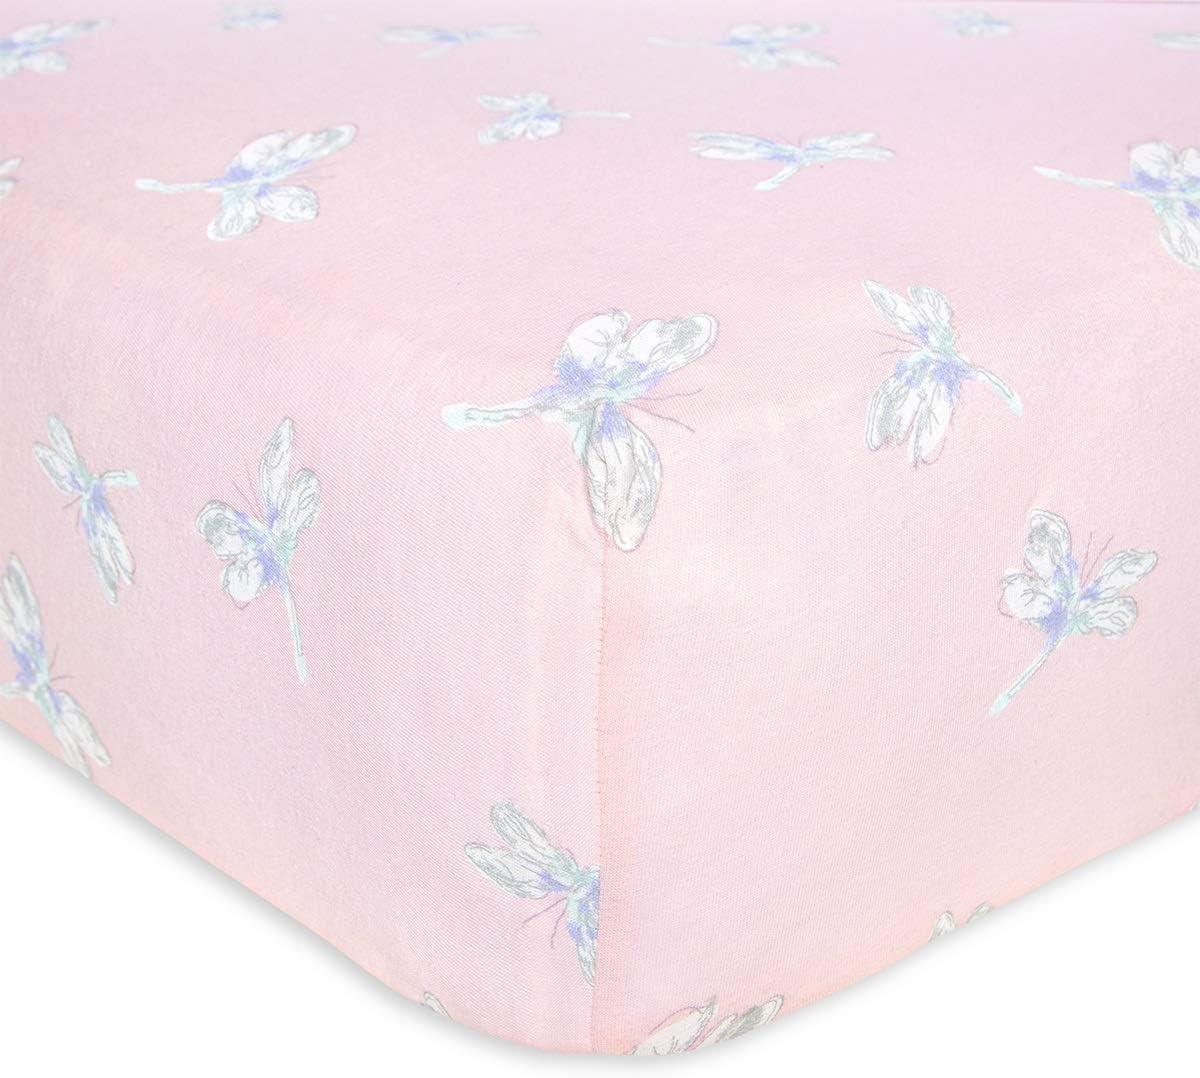 Burt's Bees Baby - Fitted Crib Sheet, Girls & Unisex 100% Organic Cotton Crib Sheet for Standard Crib and Toddler Mattresses (Pink Dragon Fly)